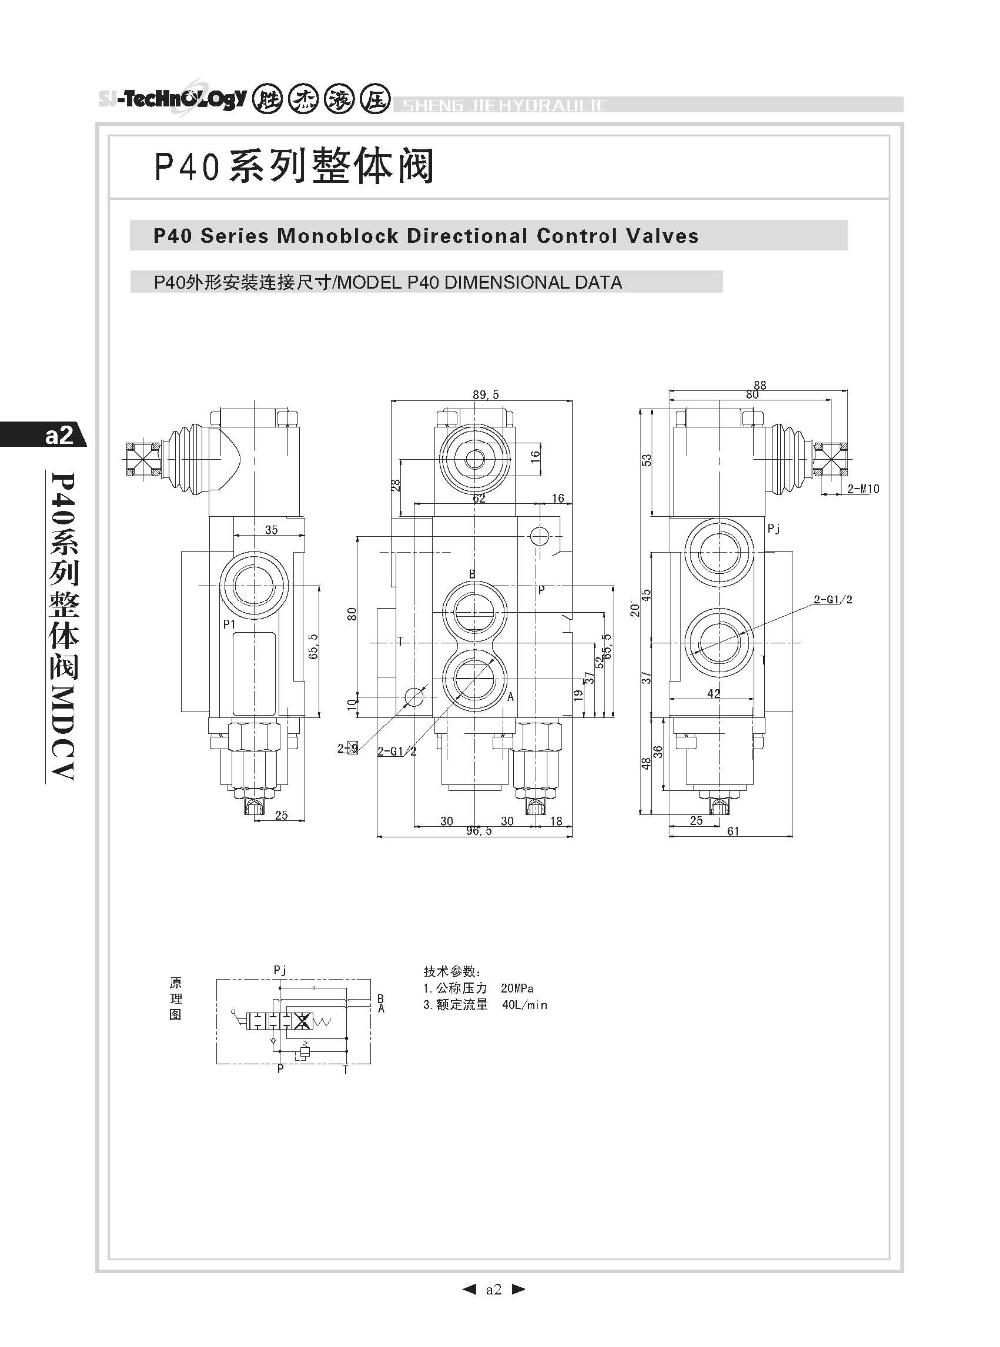 p40 series flow 40l  min 160bar pressure hydraulic parts 4p40 hydraulic monoblock directional